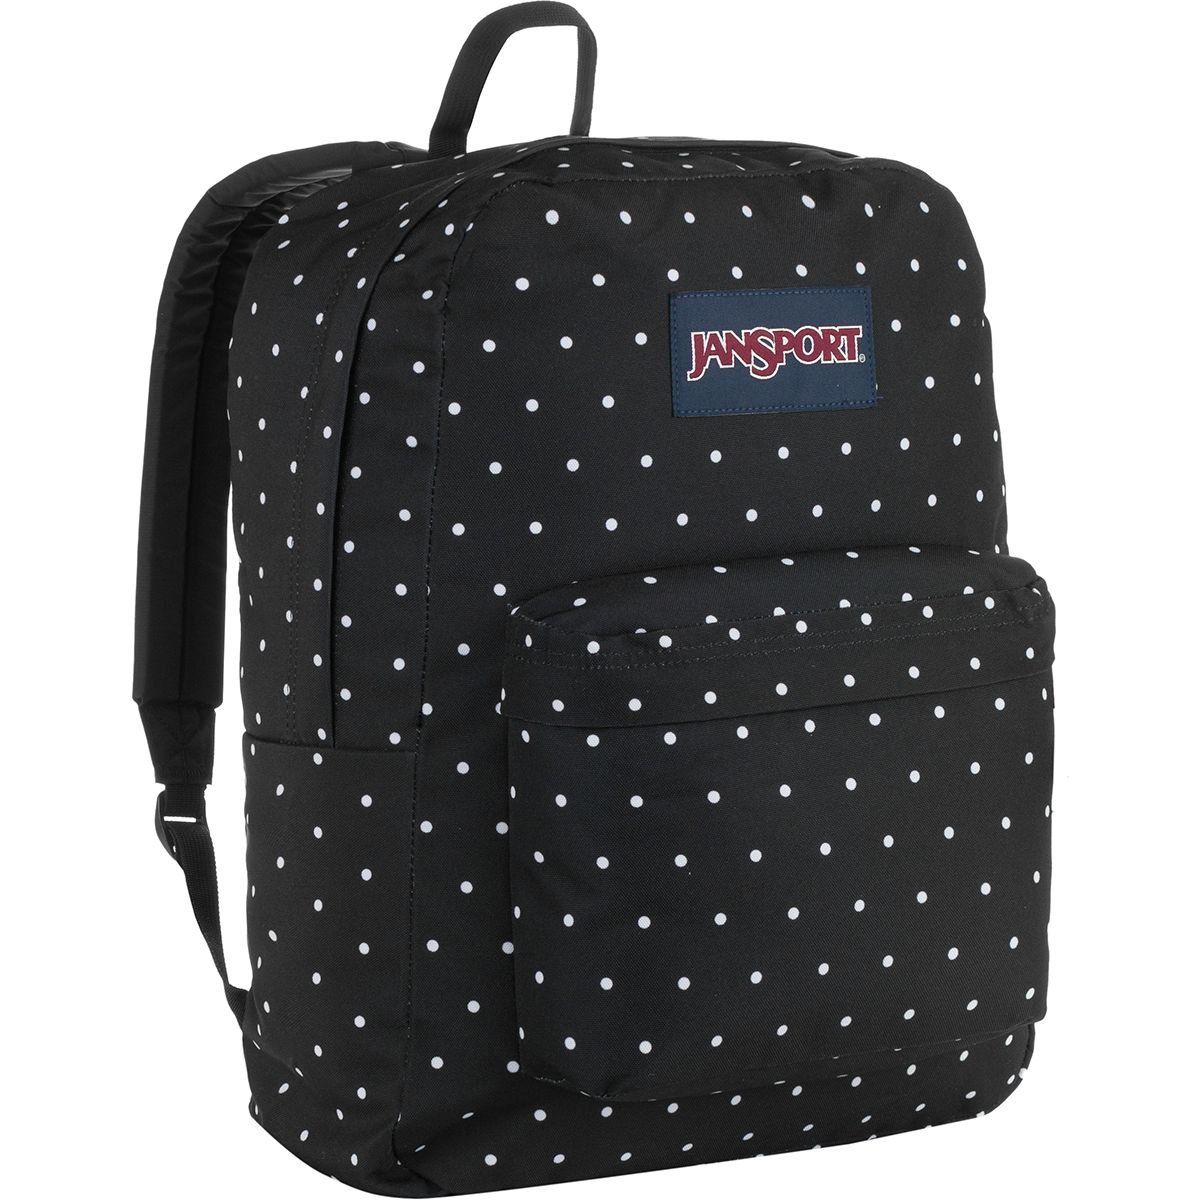 JanSport Unisex SuperBreak Black Polka Dot One Size